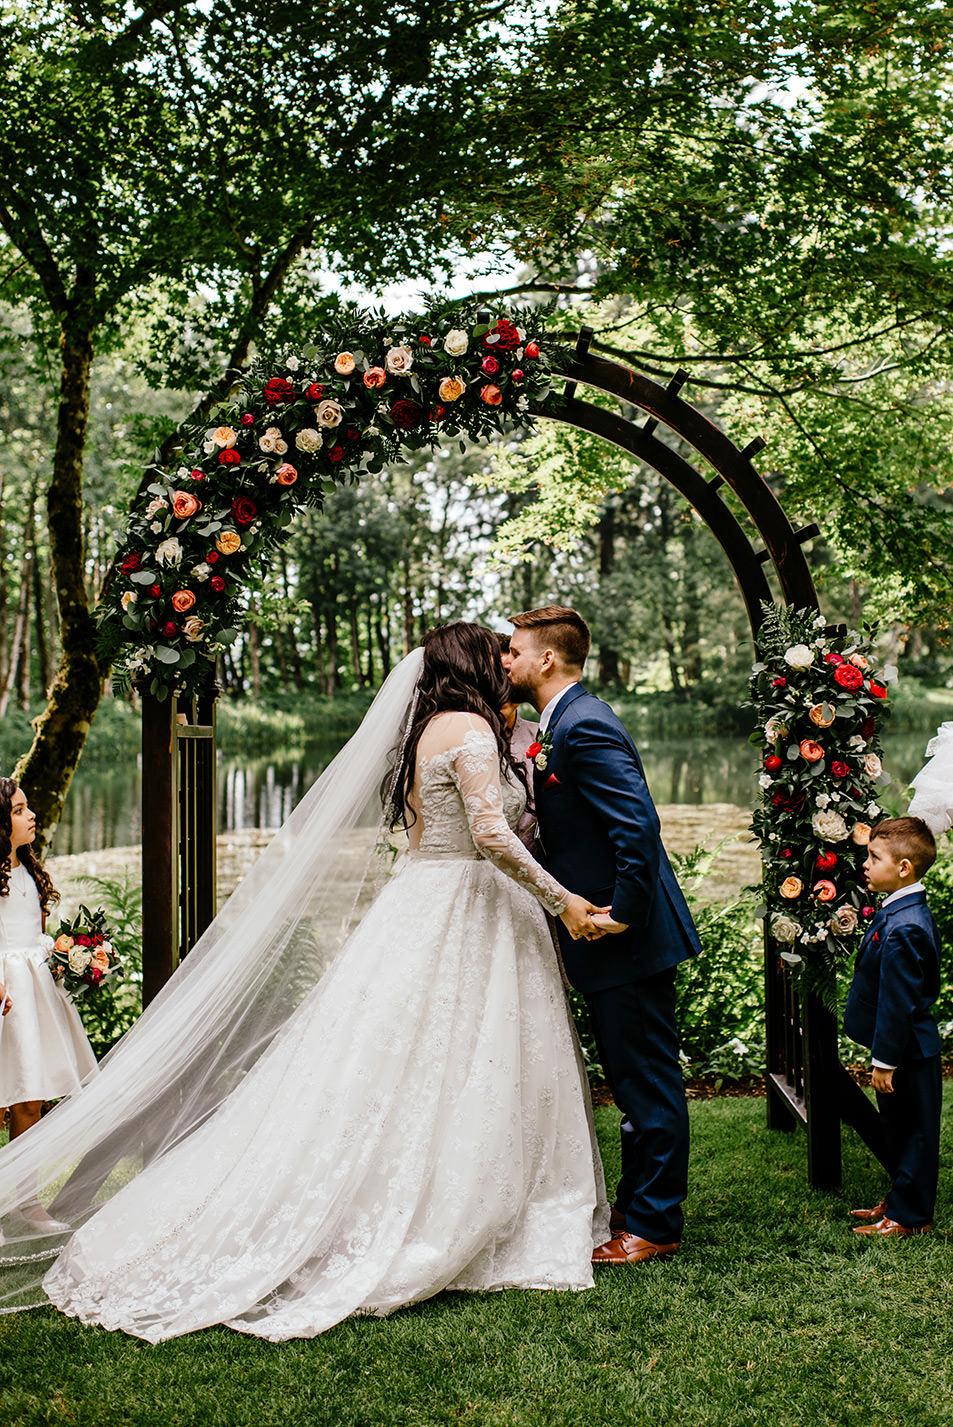 Spanish-inspired-wedding-bridal-veil-lakes-32.jpg